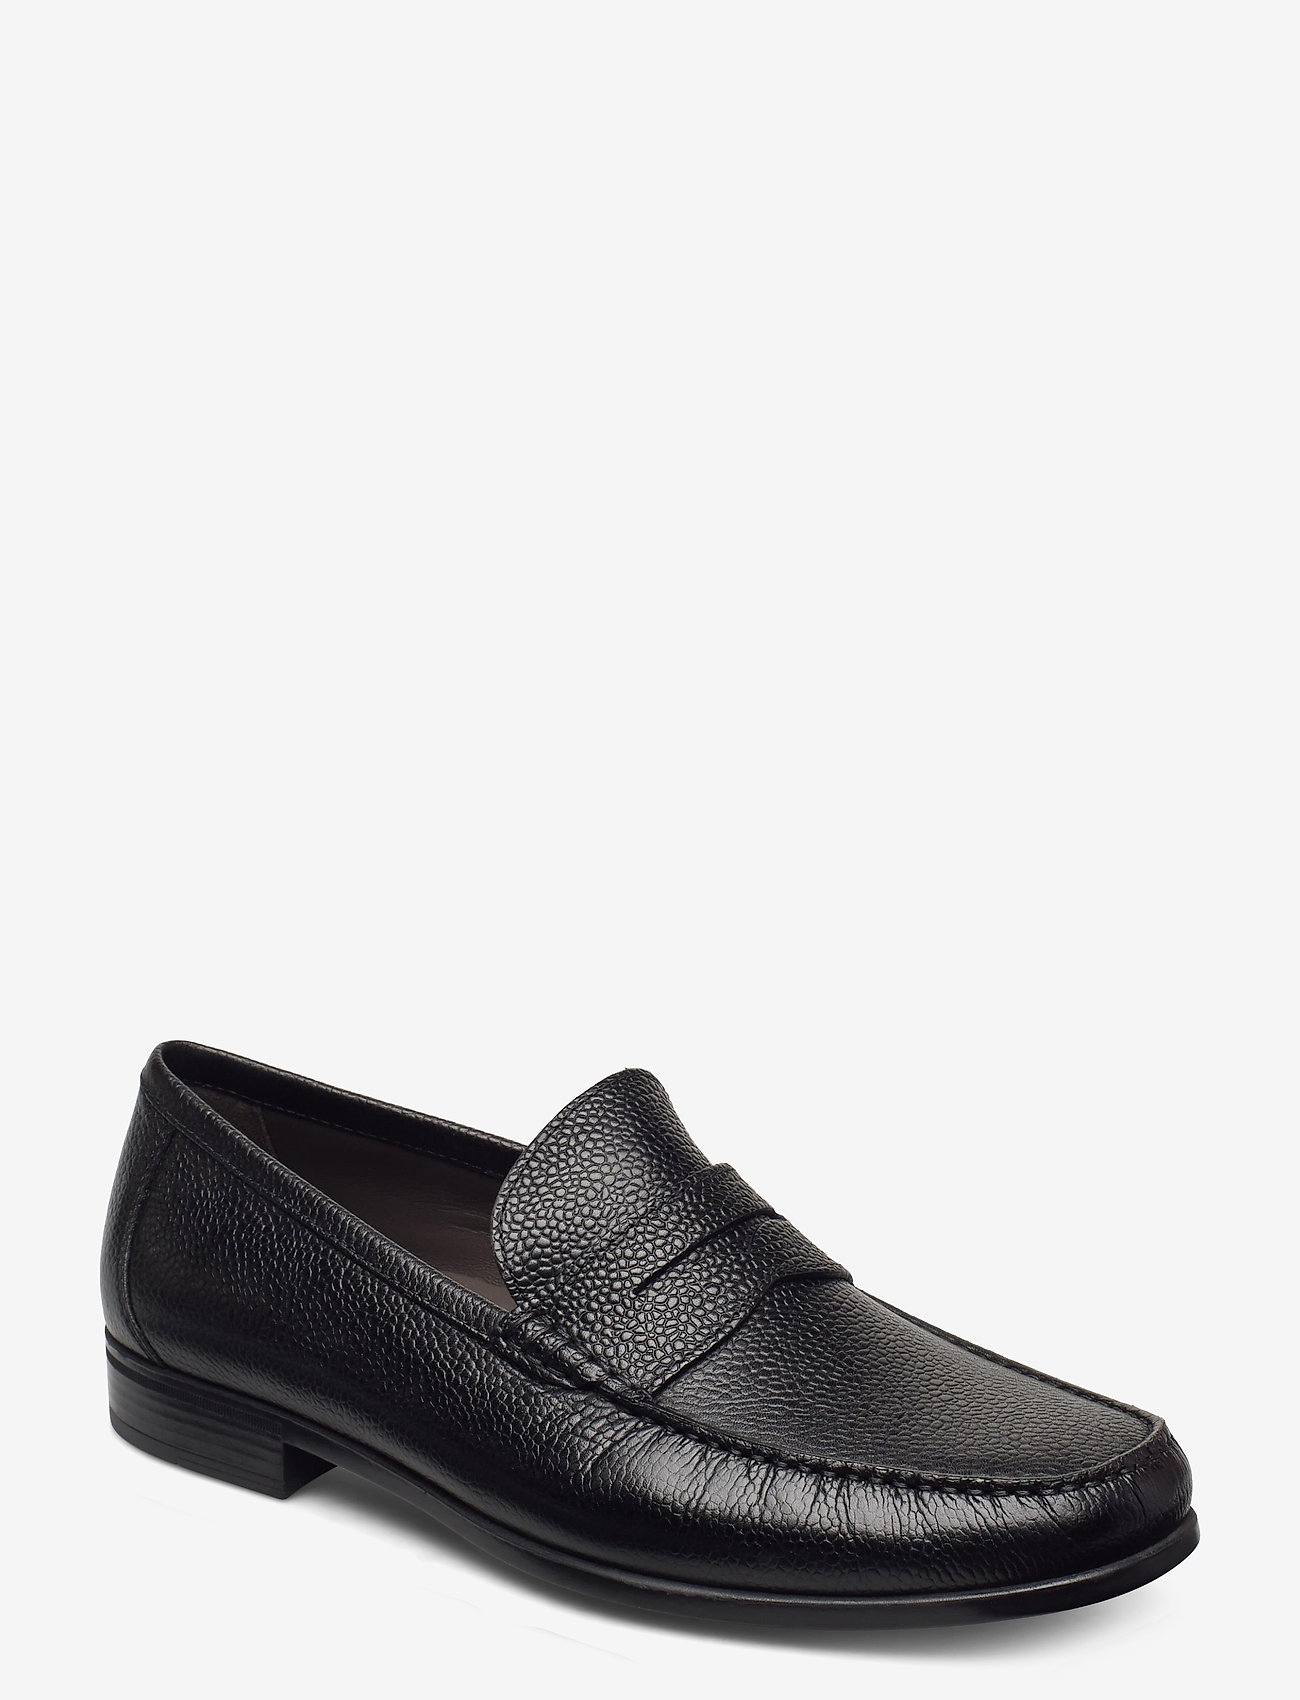 ECCO - DRESS MOC - loafers - black - 0